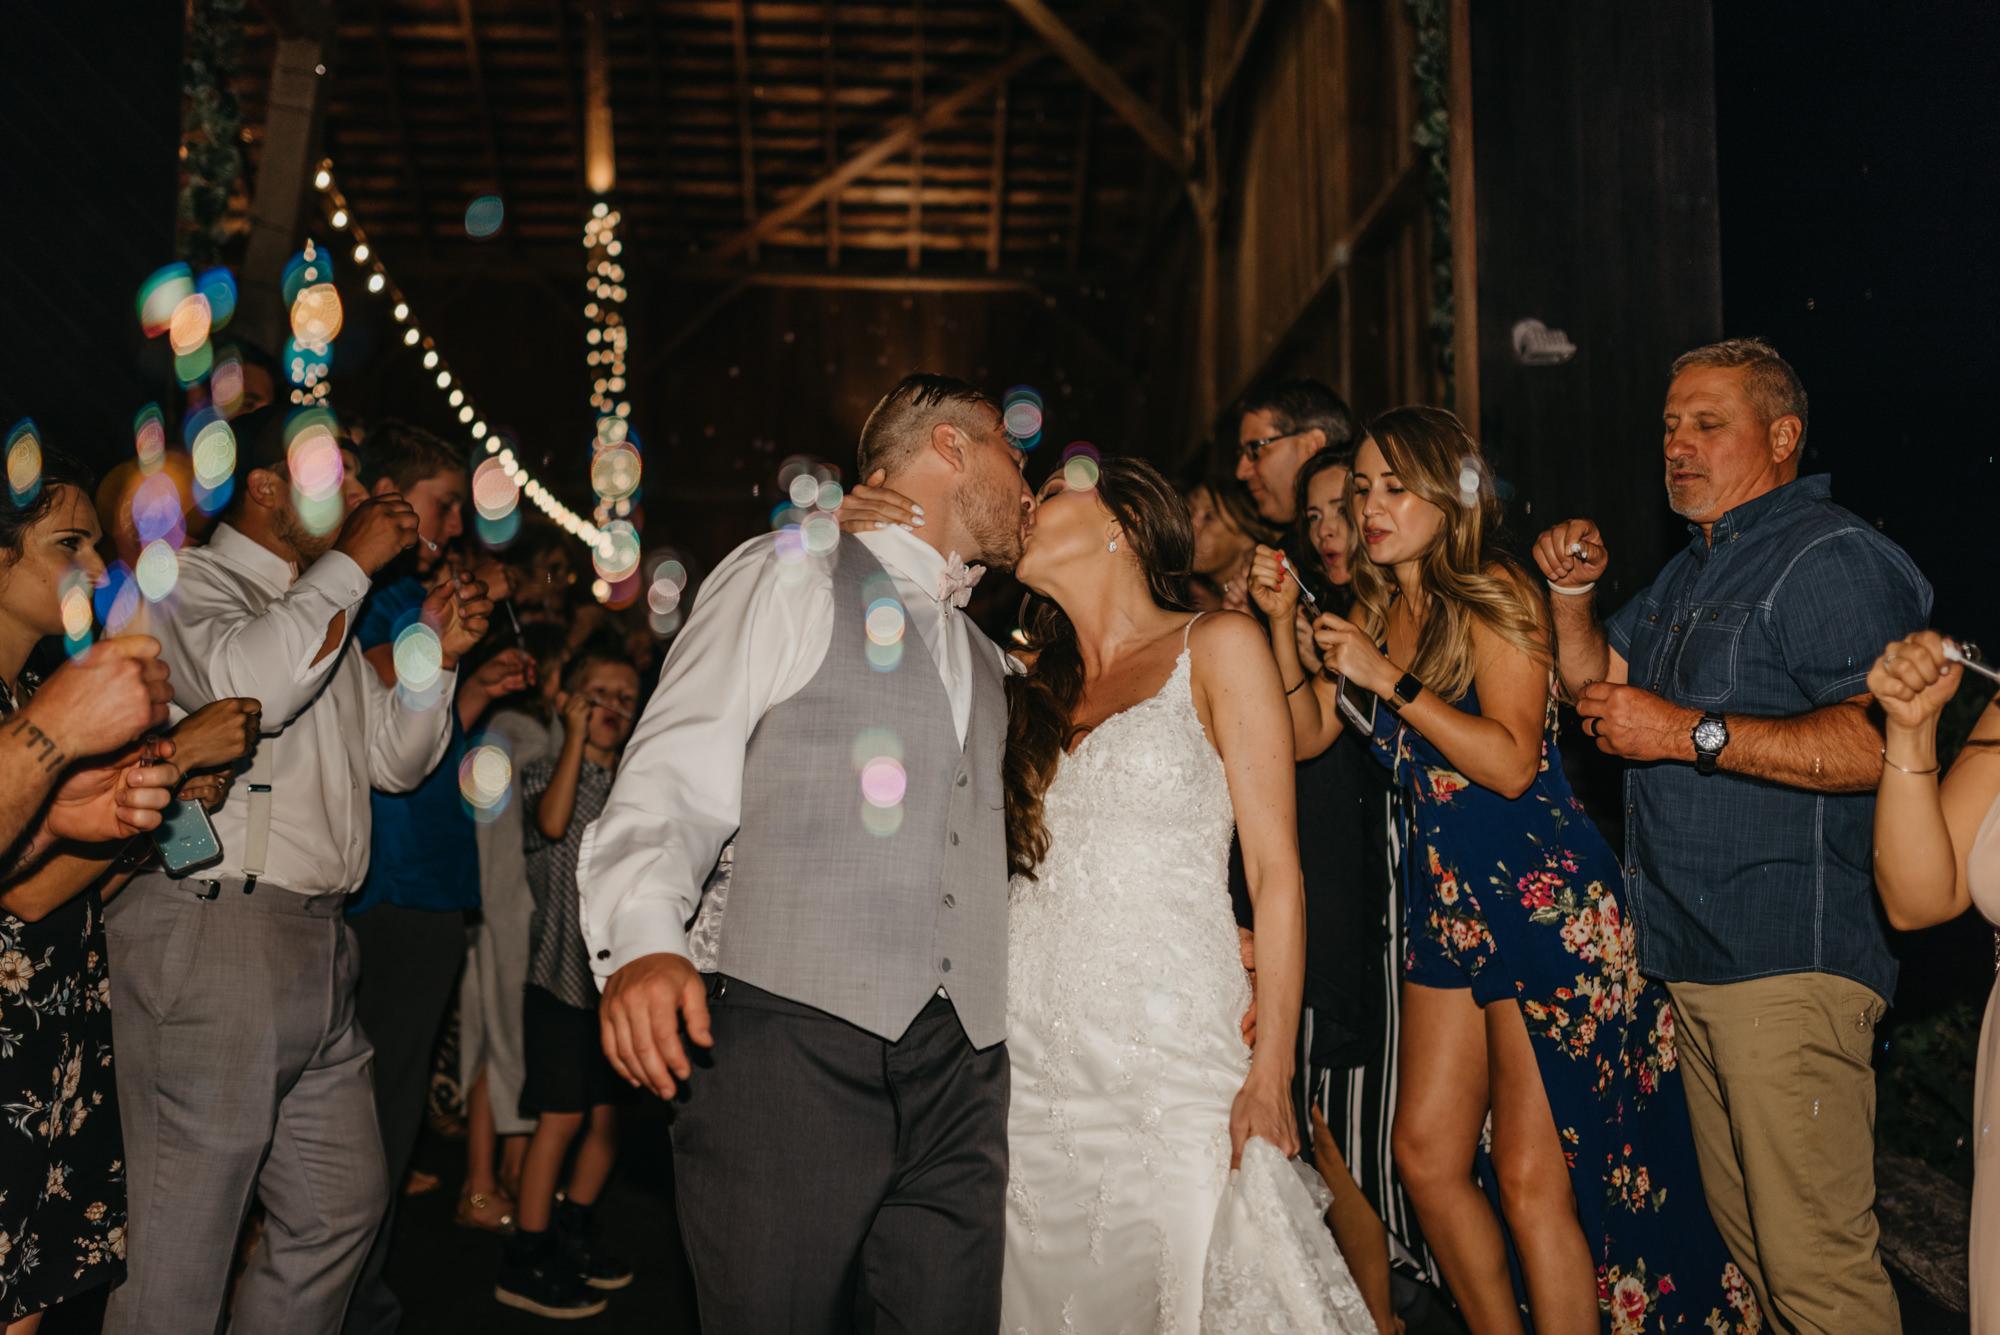 225-portland-northwest-wedding-bubble-exit-barn-string-lights.jpg